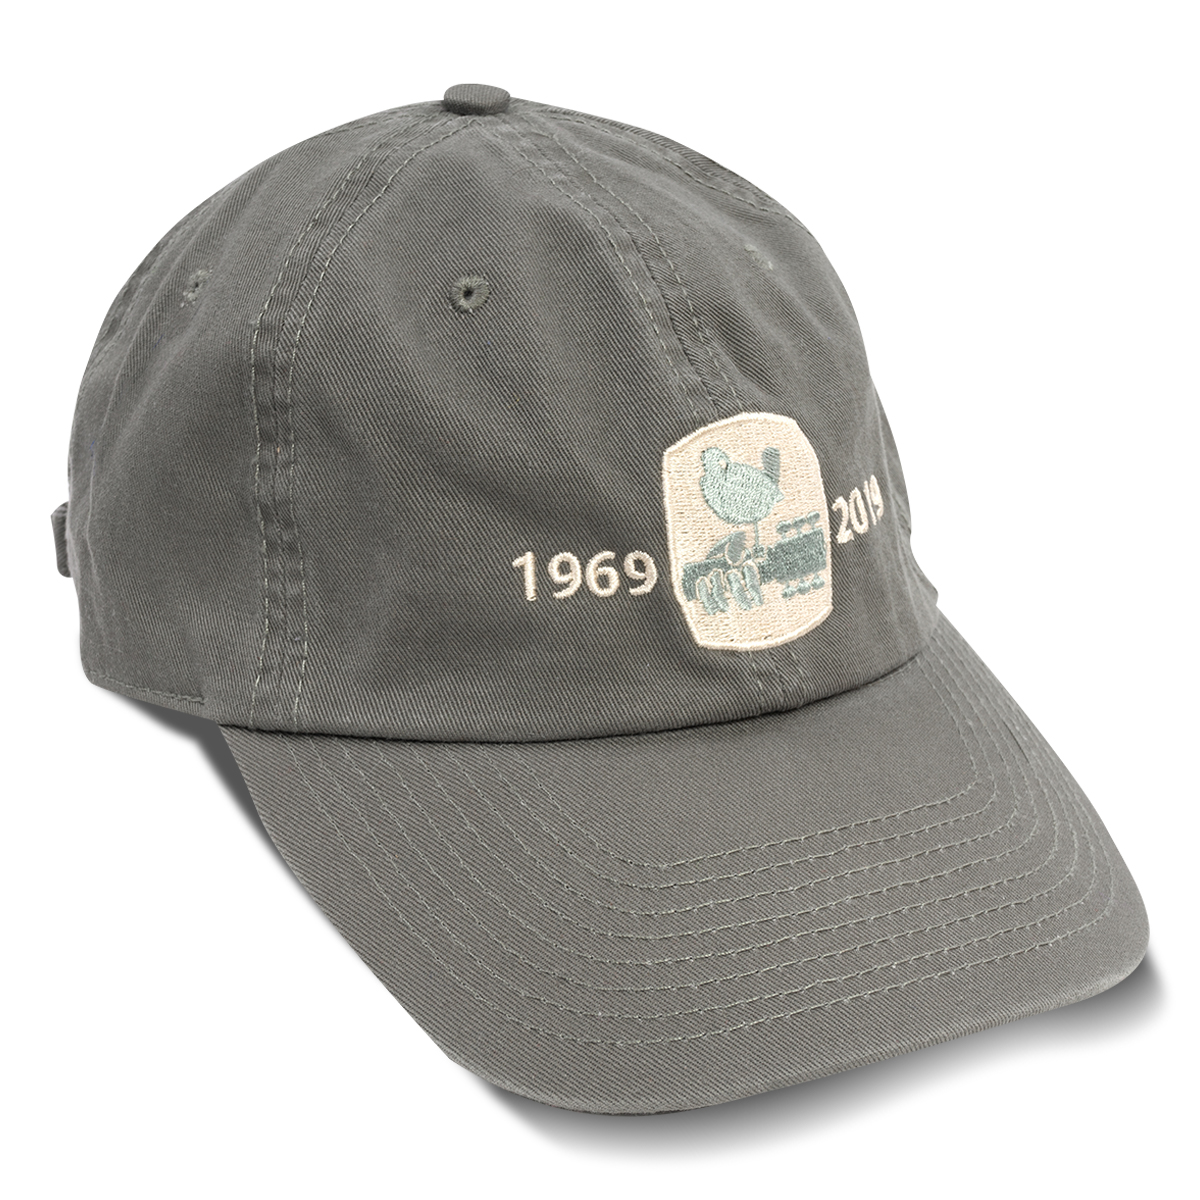 Woodstock 50th Anniversary Olive Twill Cap